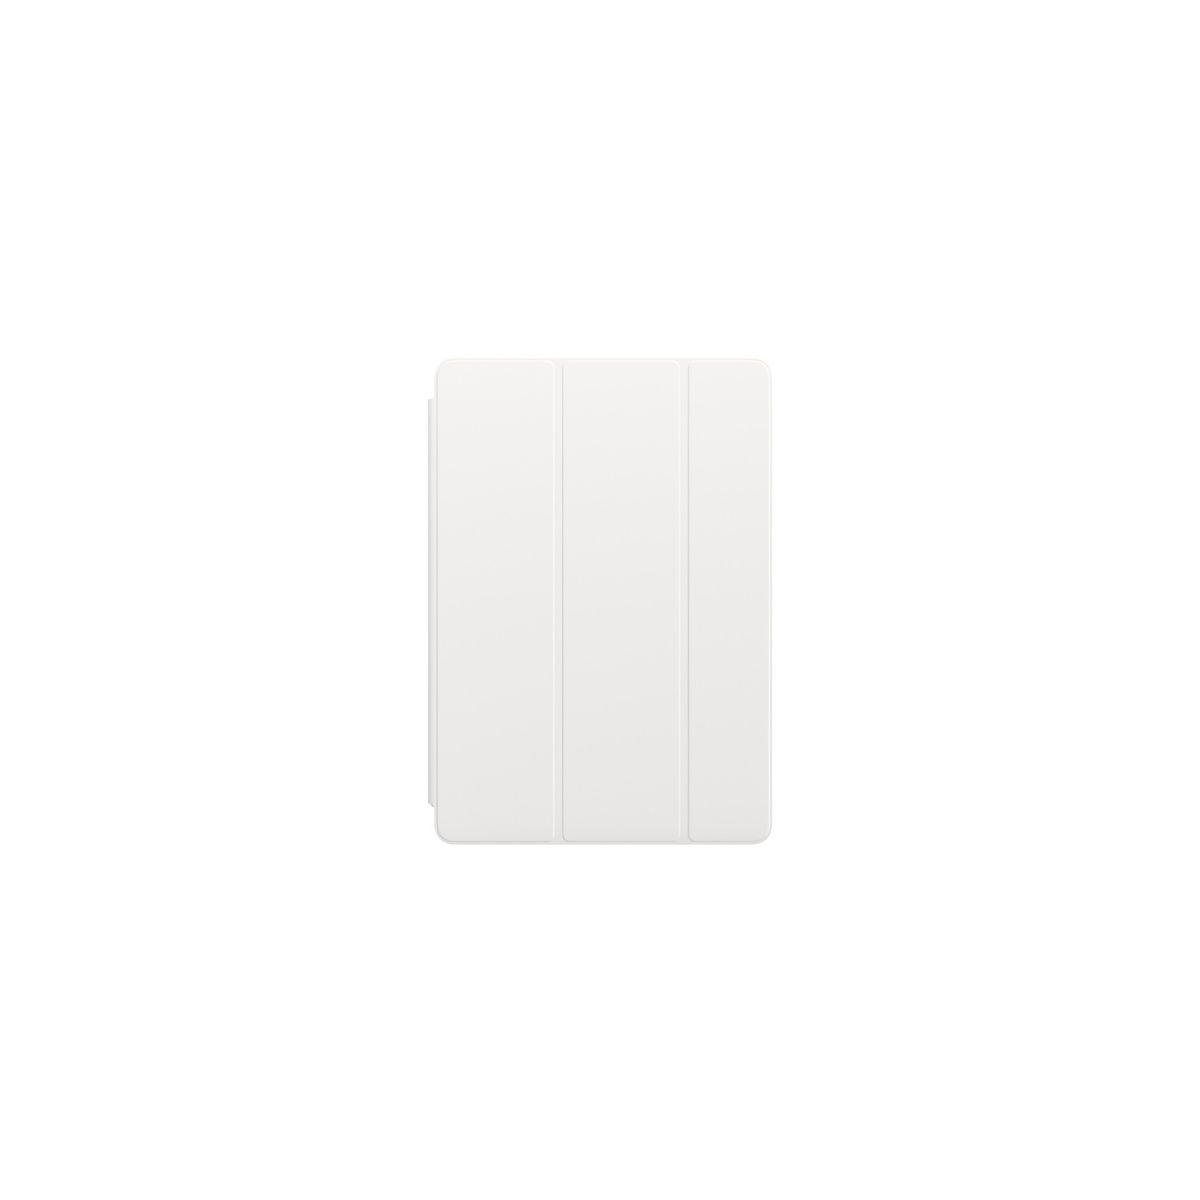 Etui tablette apple smart cover ipad pro 10.5 blanc - livraison offerte : code premium (photo)